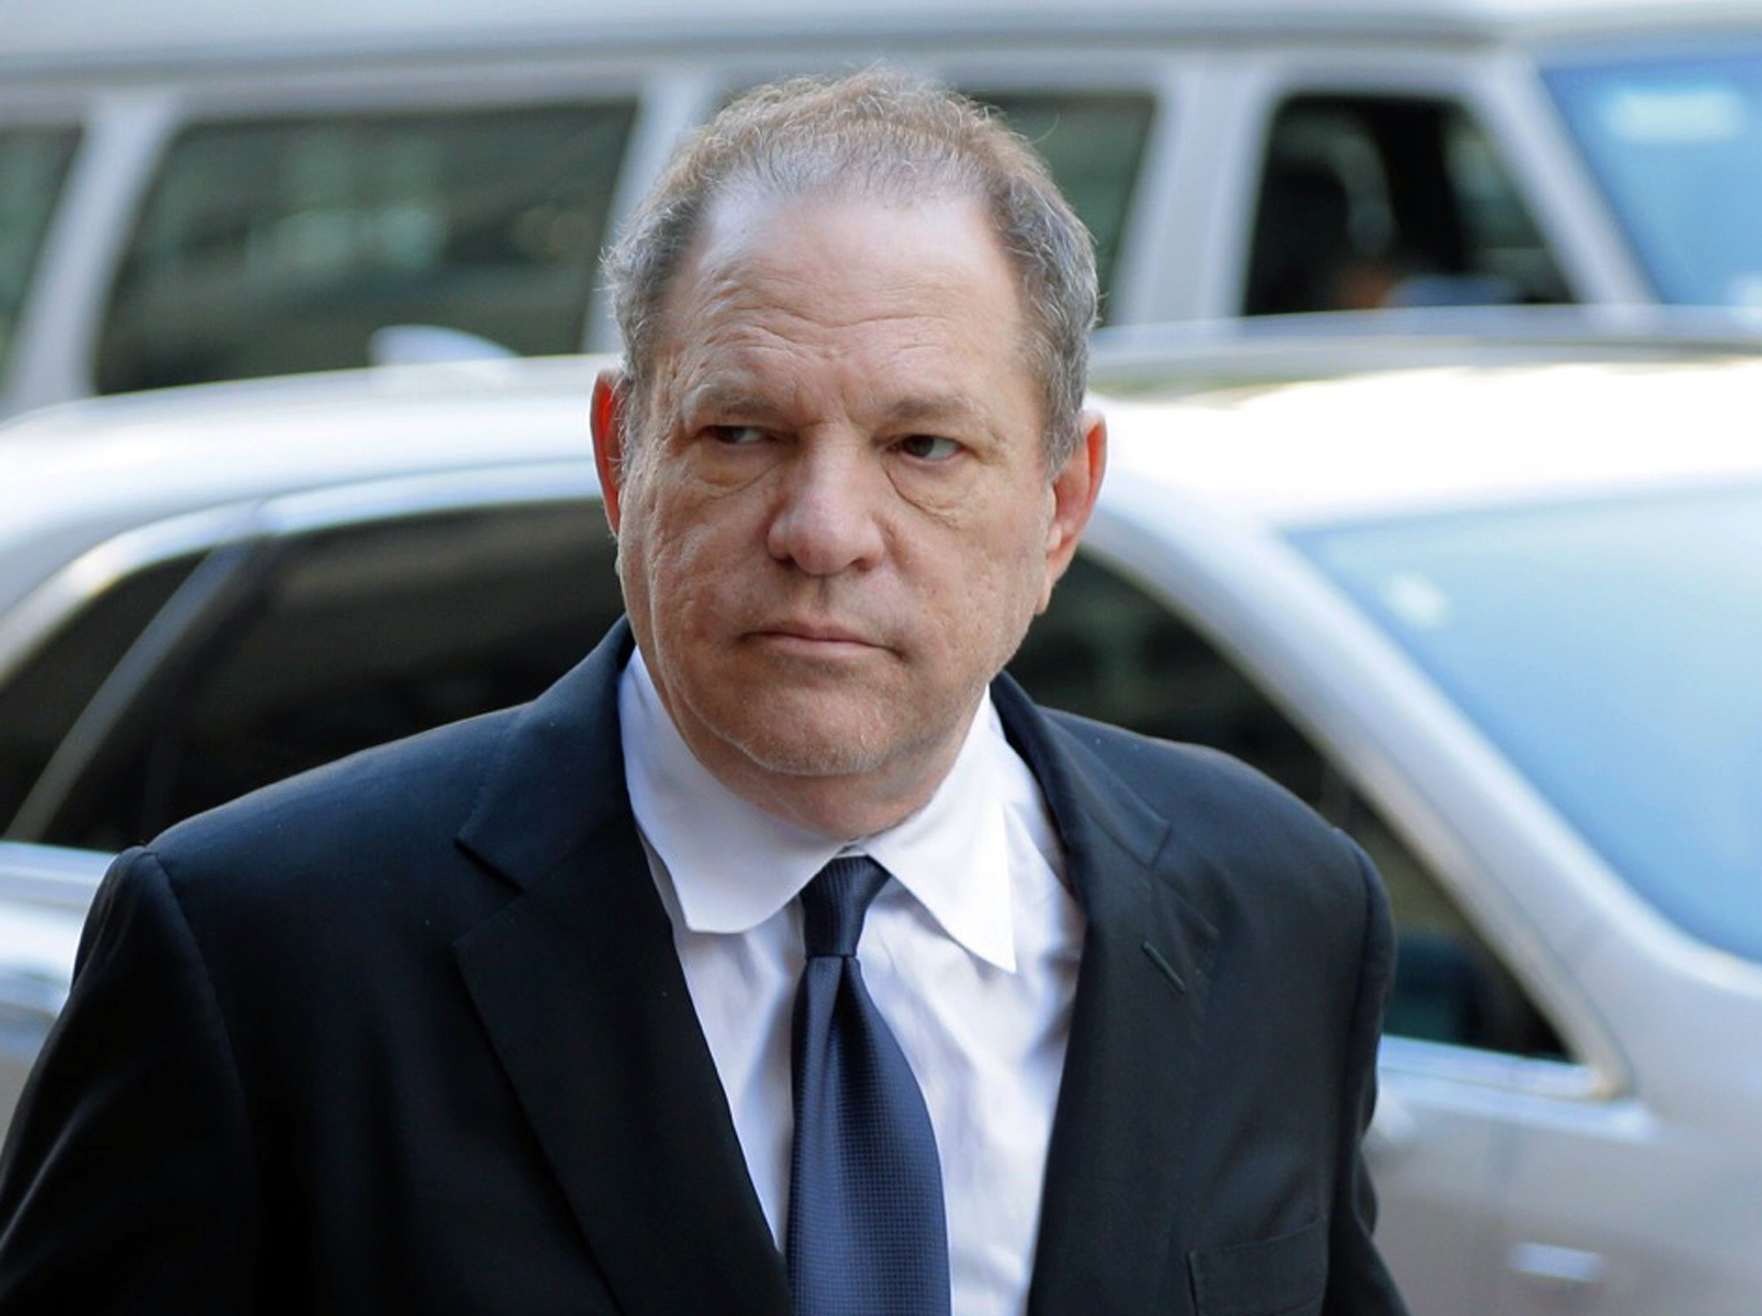 Westlake Legal Group AP20003657159750 Harvey Weinstein expected in court as trial set to get underway Sasha Savitsky fox-news/us/crime/sex-crimes fox-news/entertainment/events/scandal fox-news/entertainment/events/in-court fnc/entertainment fnc Associated Press article ae8f0036-591d-568e-8bd5-e352e00962f9